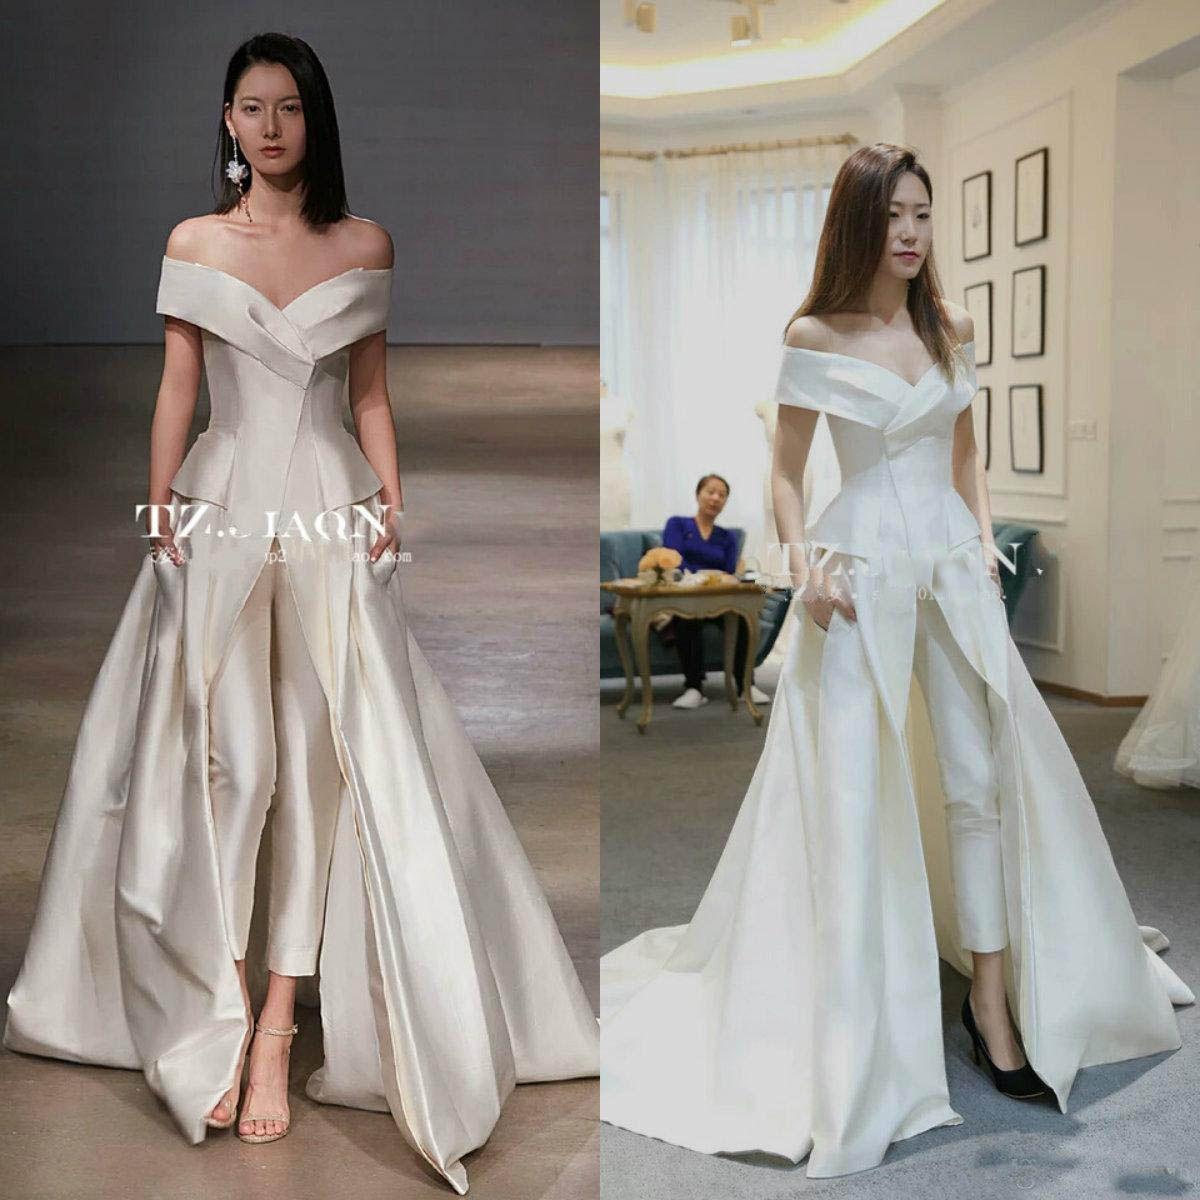 2018 Fashion Elegant White Evening Dresses Jumpsuit Pants ...